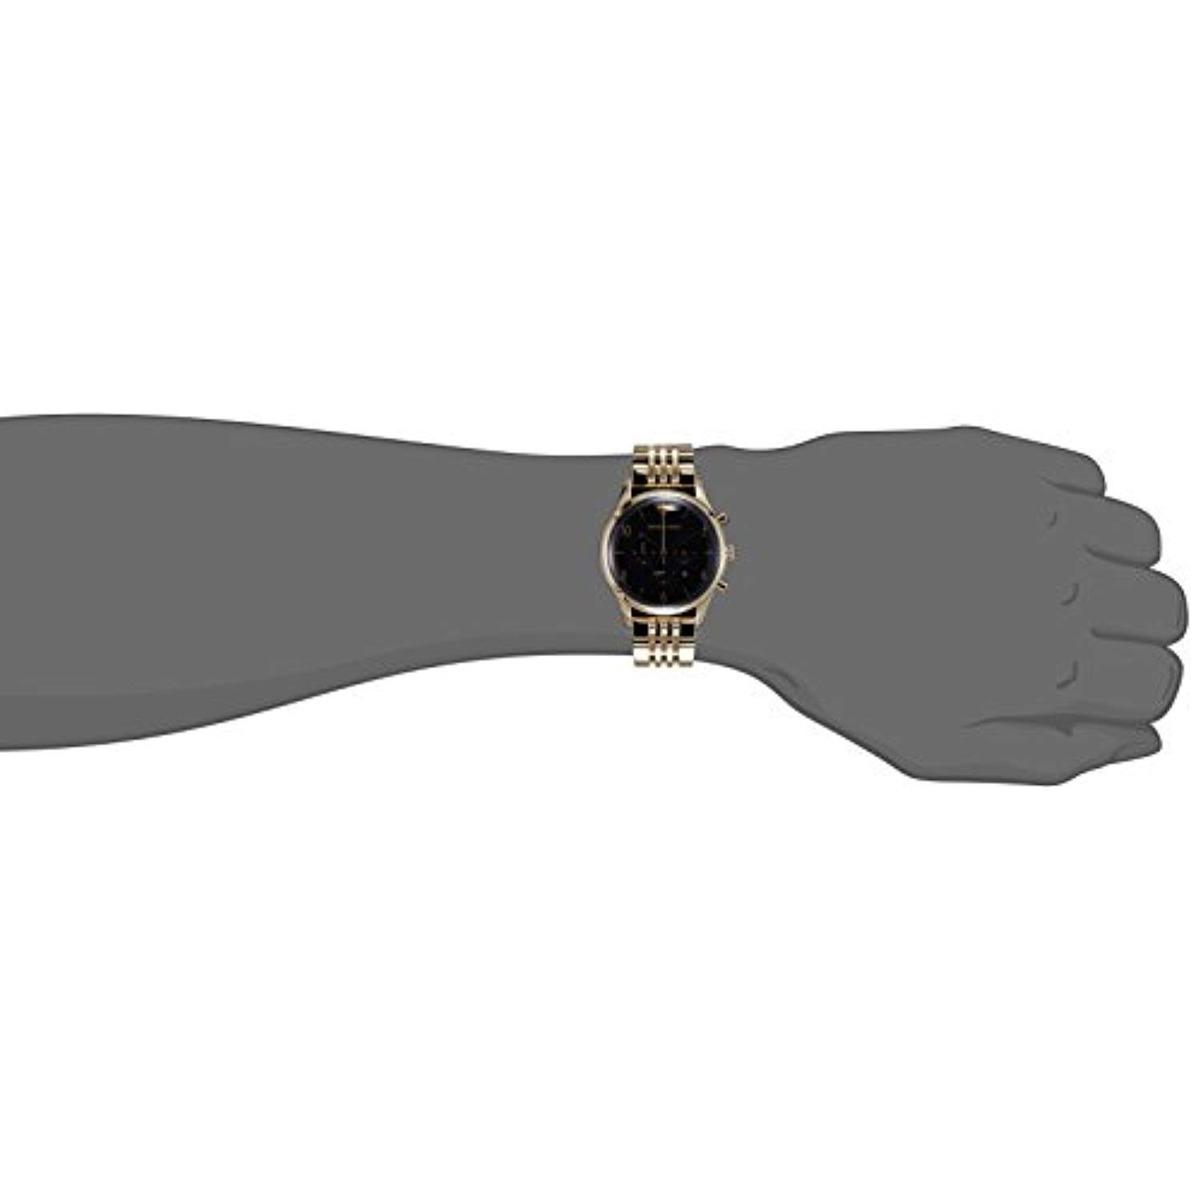 ced11d3a0ccd reloj hombre vestido ar1893 de hombre emporio armani dorado. Cargando zoom.